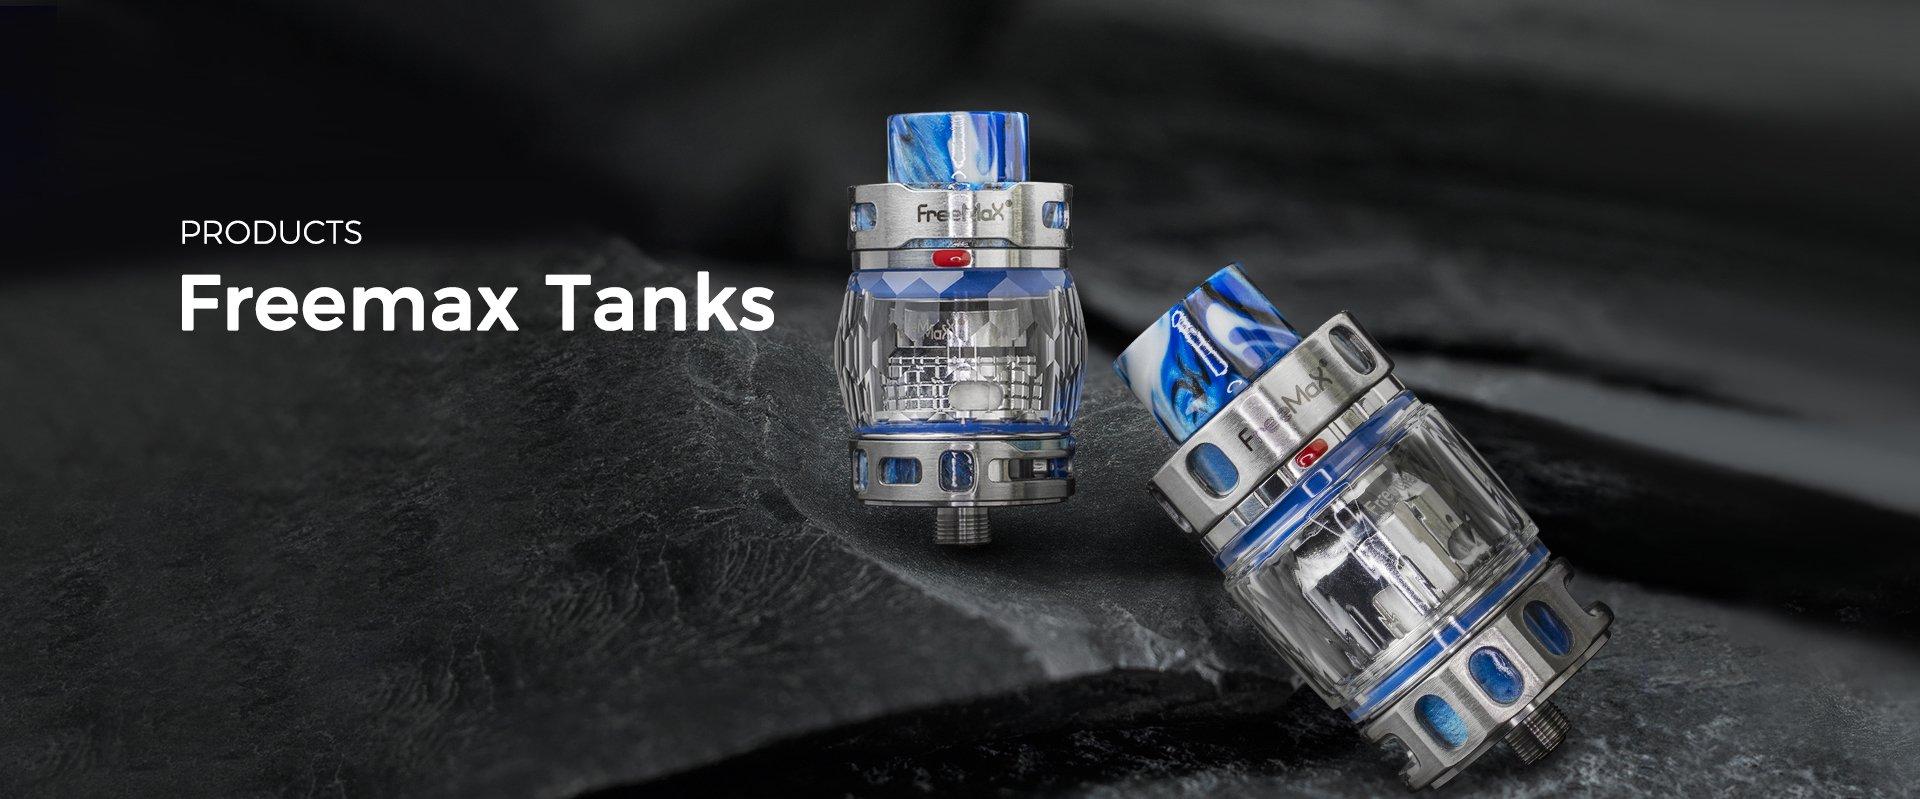 freemax-tanks